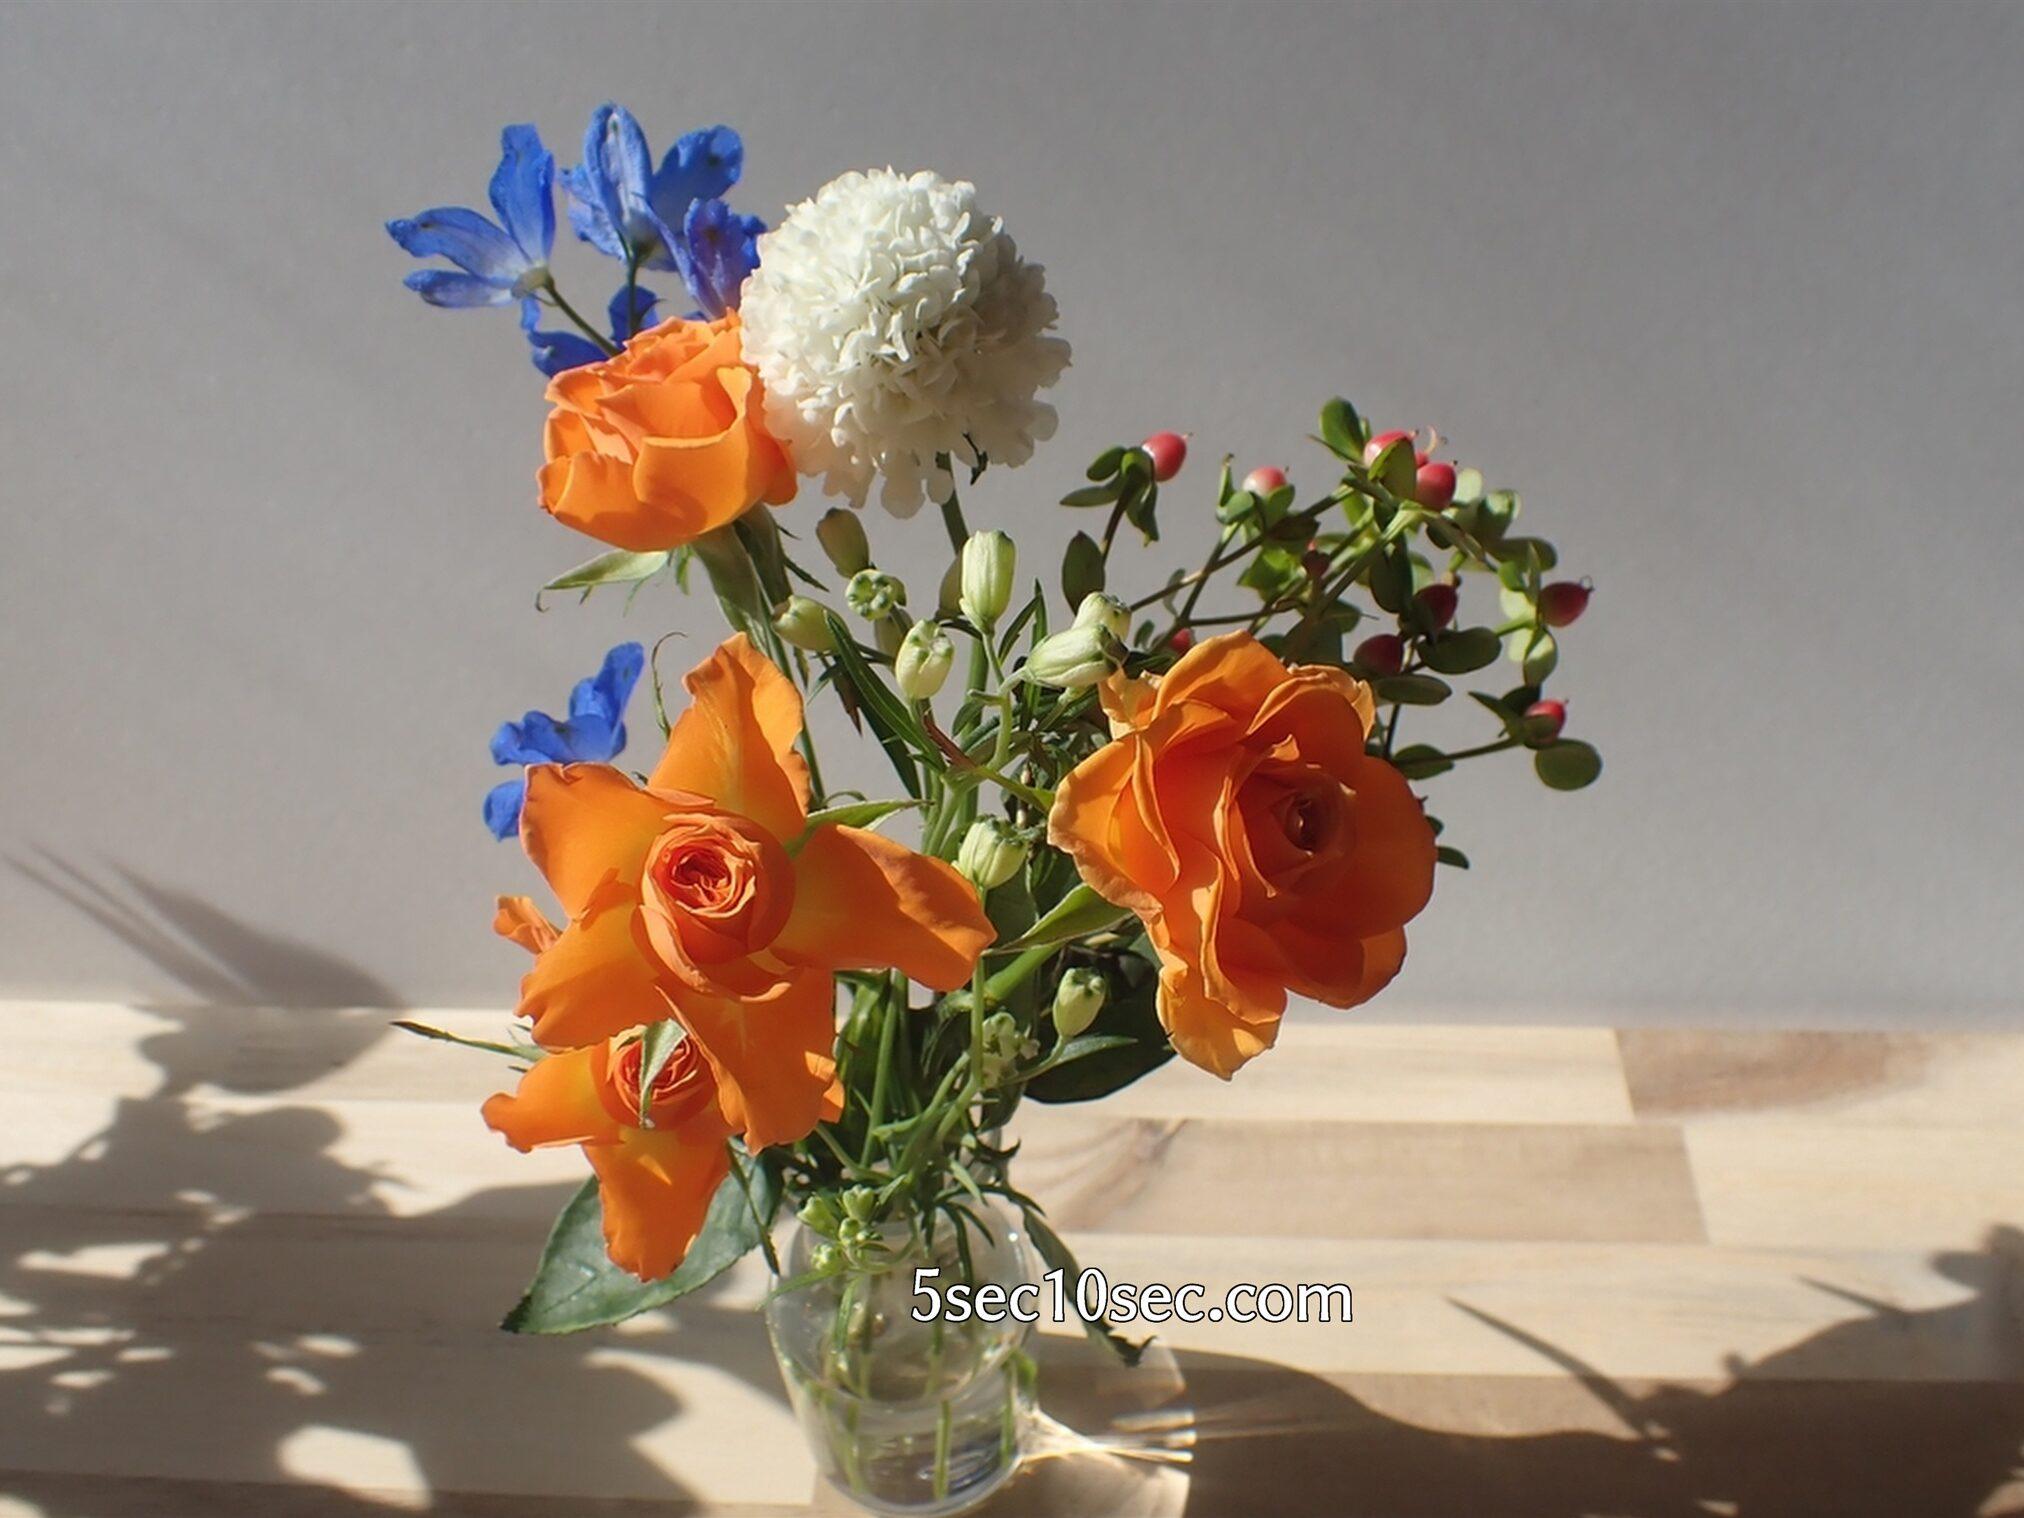 Bloomee LIFE(ブルーミーライフ)レギュラープラン 今週のお花 同じお花で、咲いているものと、つぼみのものを組み合わせたフラワーアレンジ